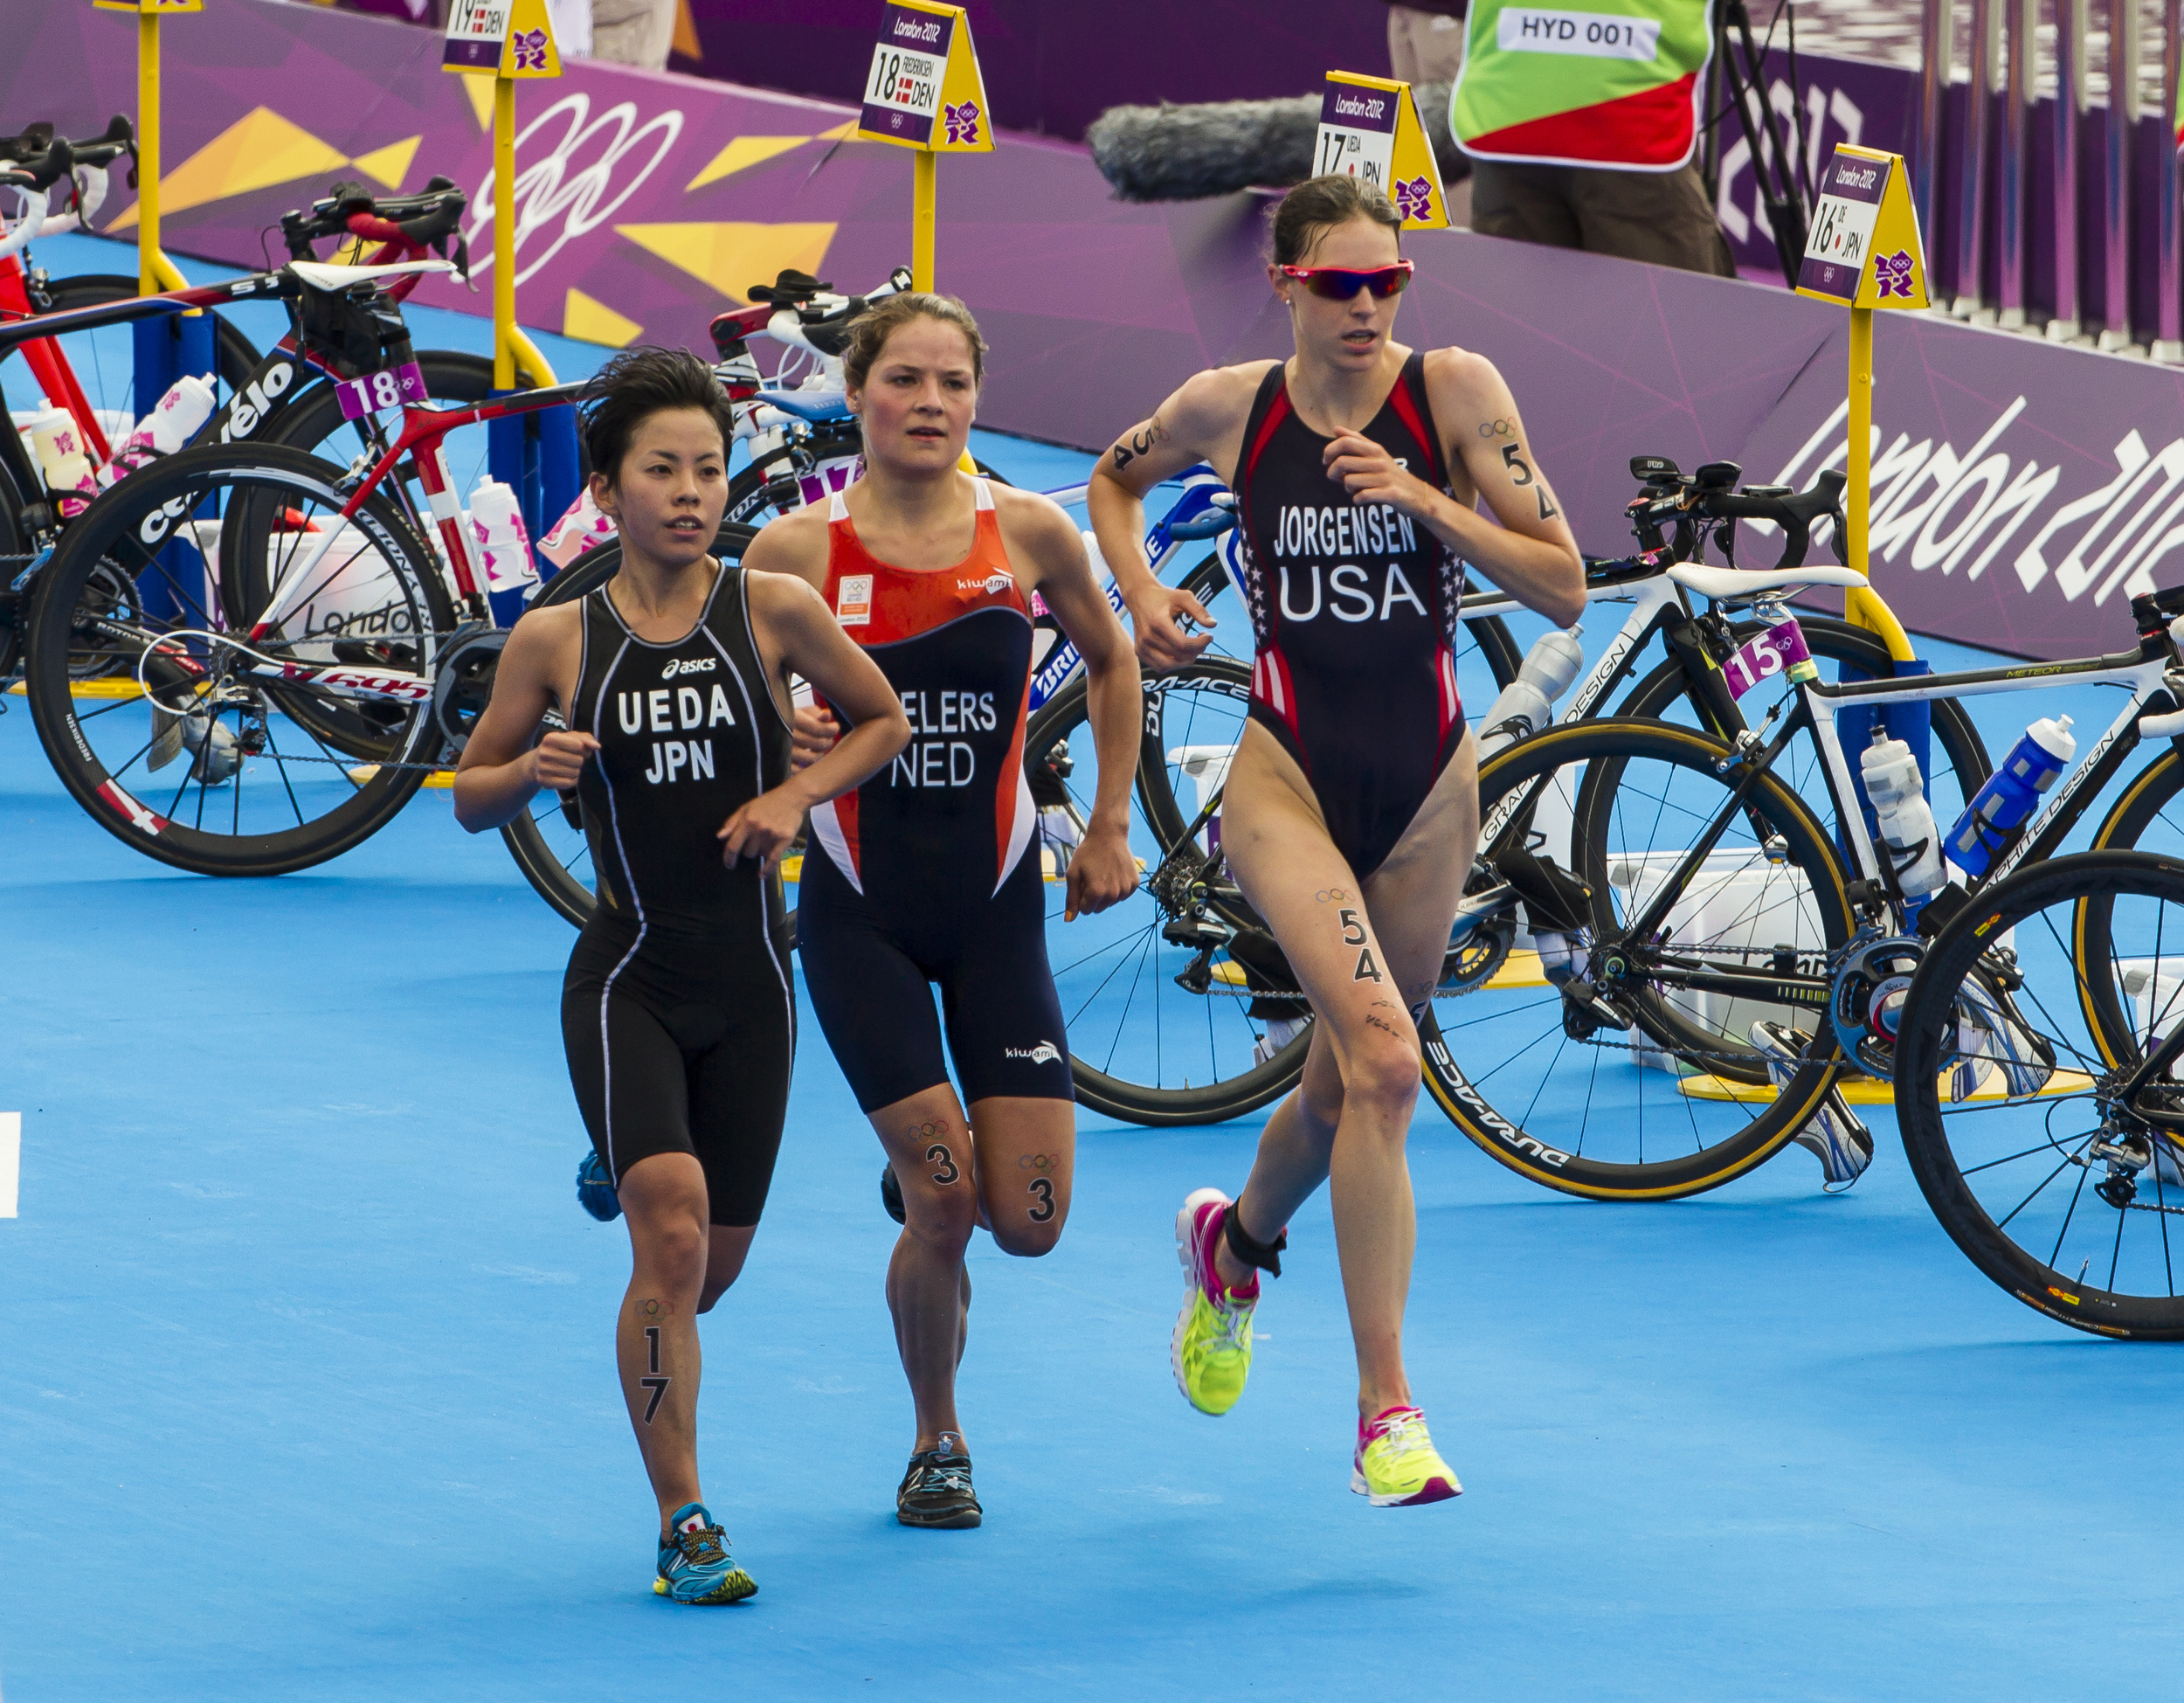 2012 Olympics.jpg